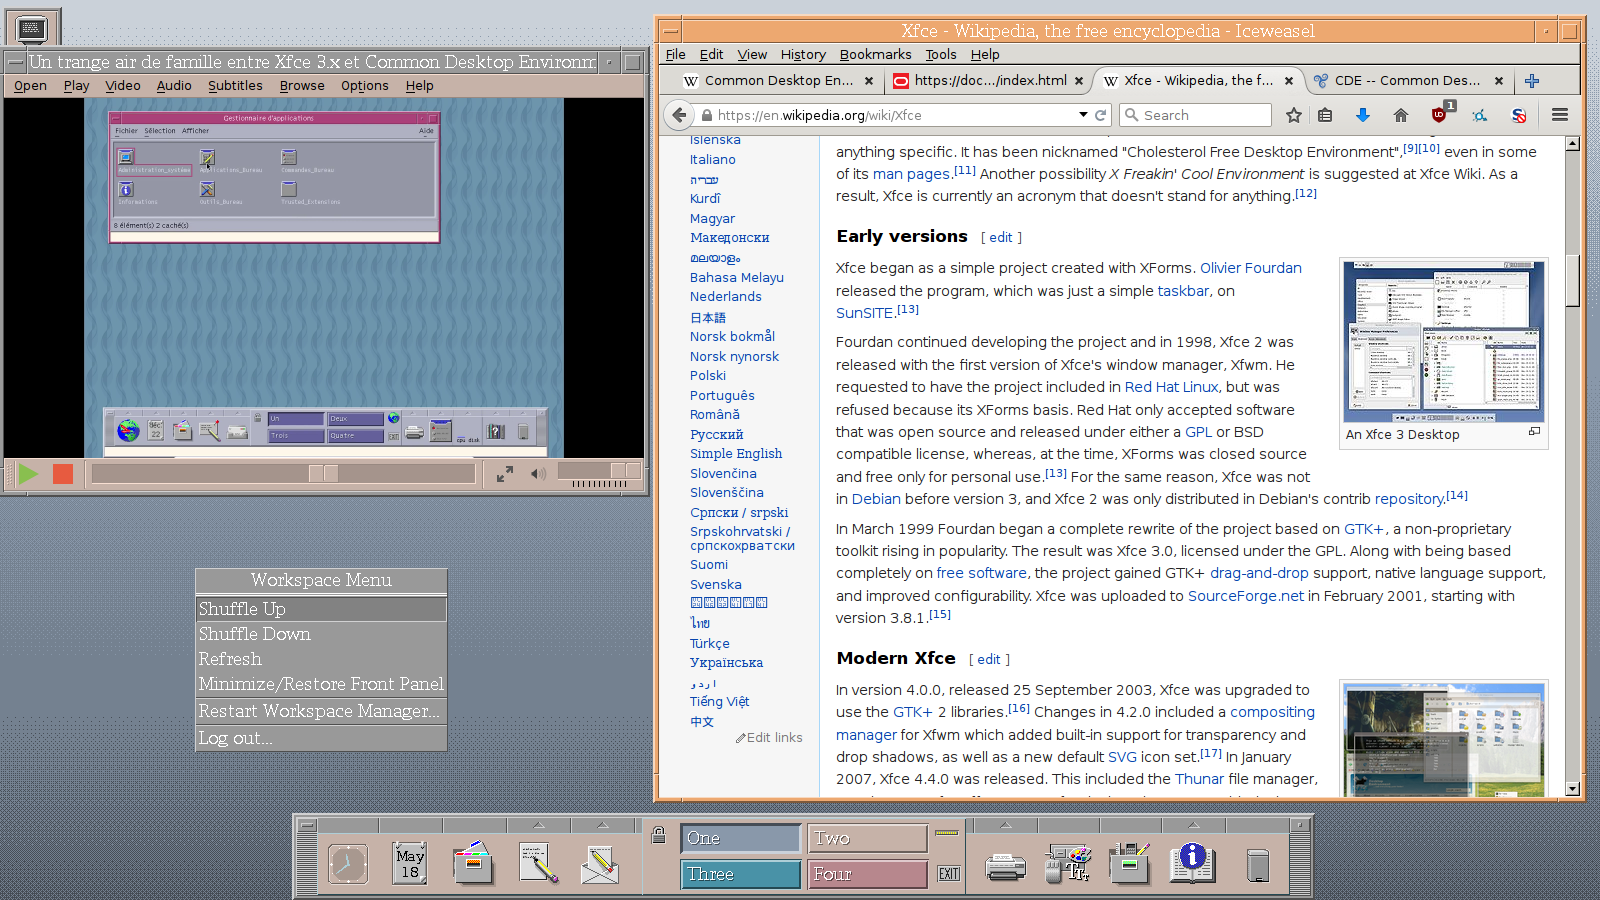 CDE -- Common Desktop Environment | Trisquel GNU/Linux - Run